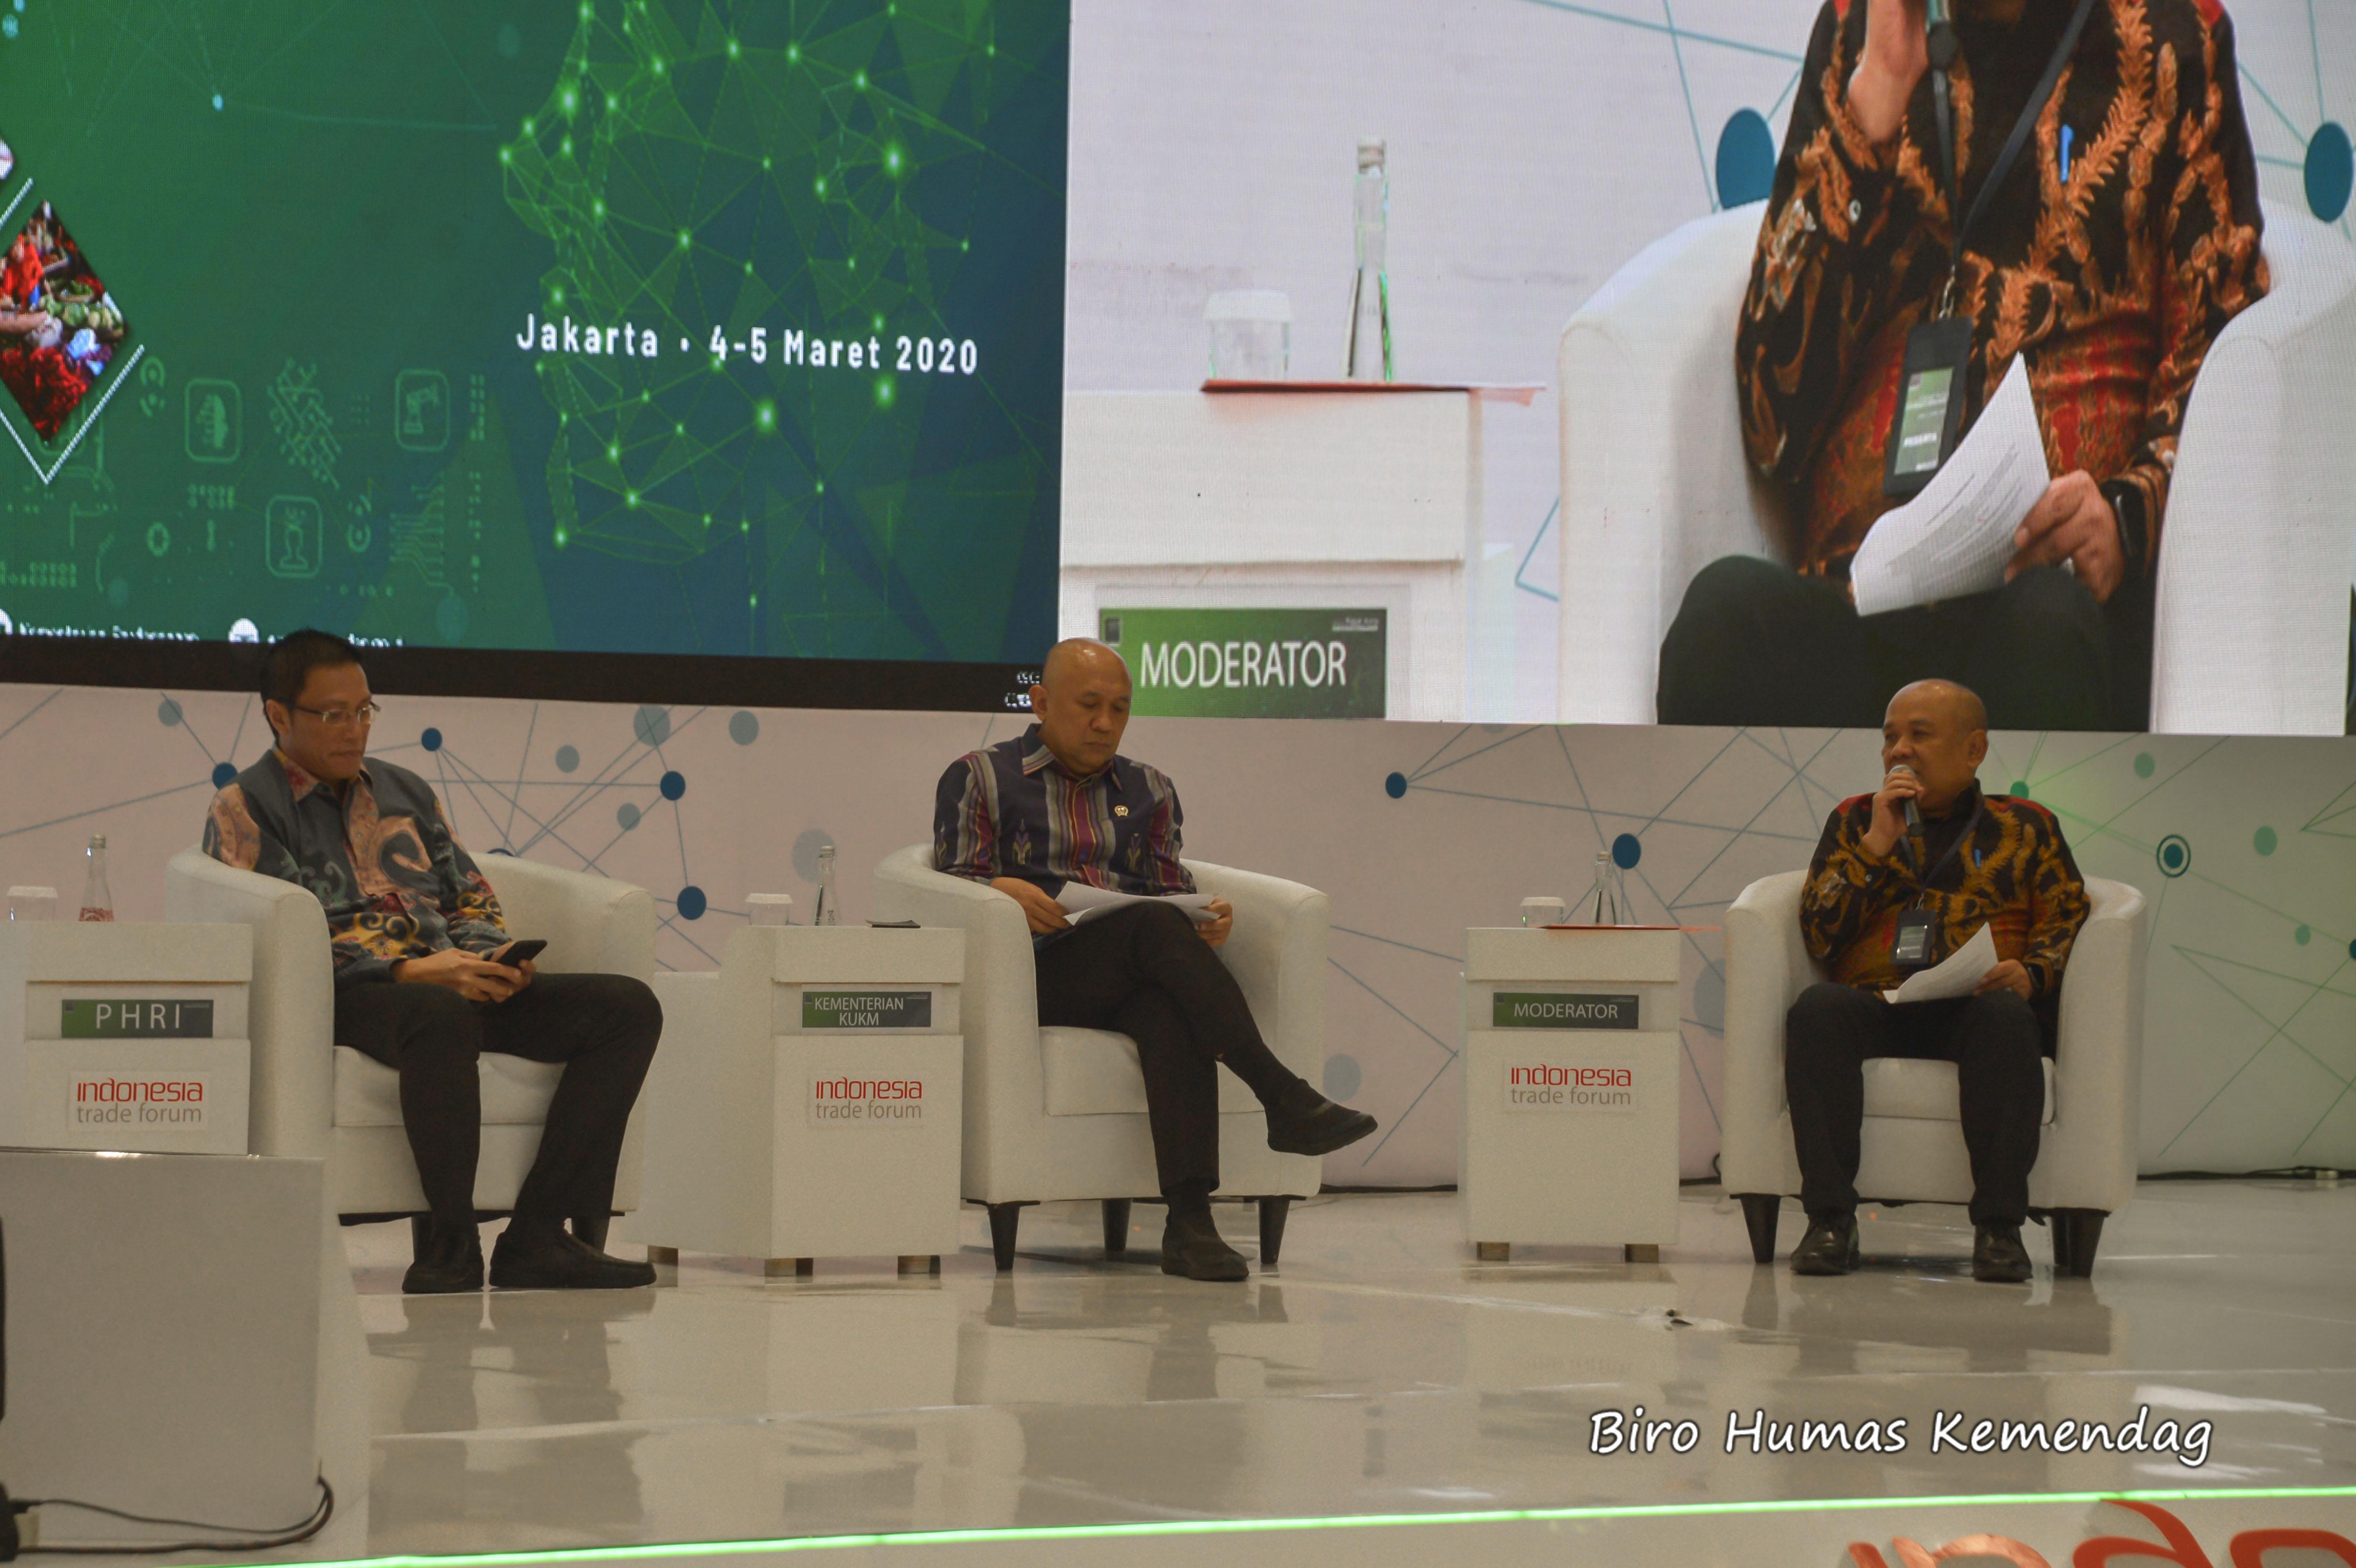 Kementerian Perdagangan Republik Indonesia Diskusi Panel Sinergitas Pemberdayaan Umkm Dalam Penguatan Pasar Dalam Negeri